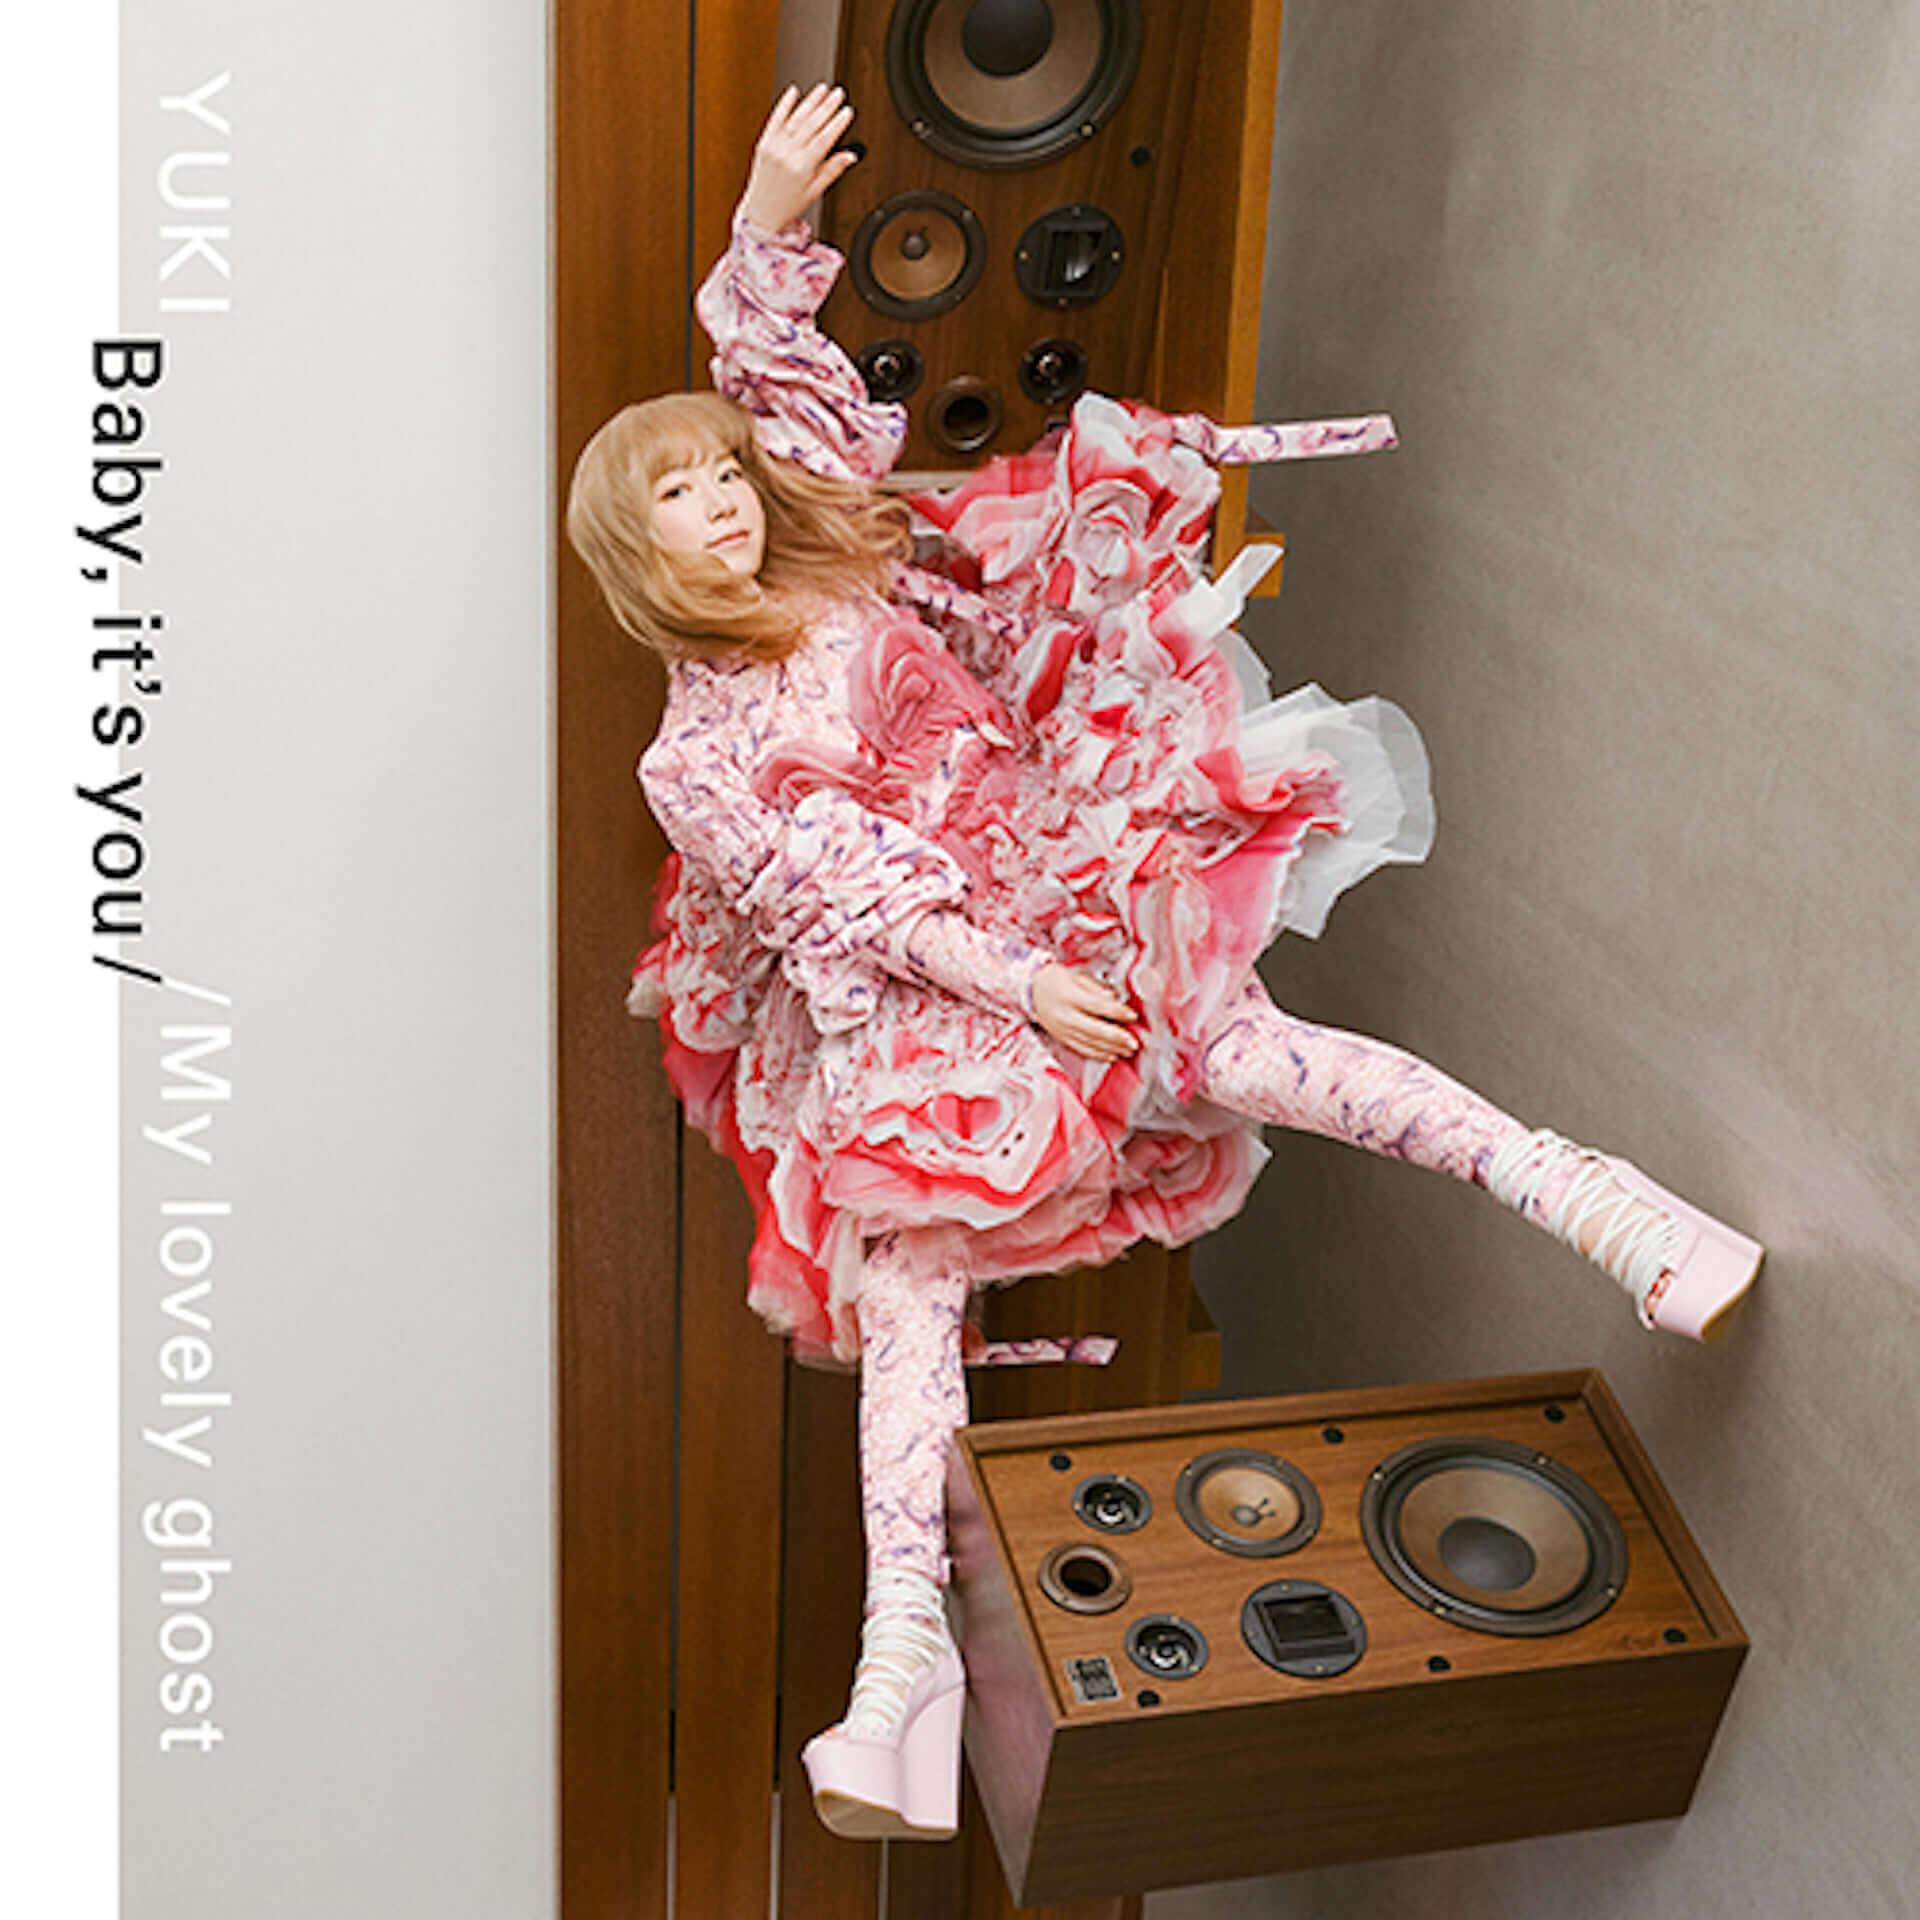 YUKIが約2年ぶりのニューアルバム『Terminal』をリリース決定!初回盤にはDVDが付属 music210303_yuki_1-1920x1920